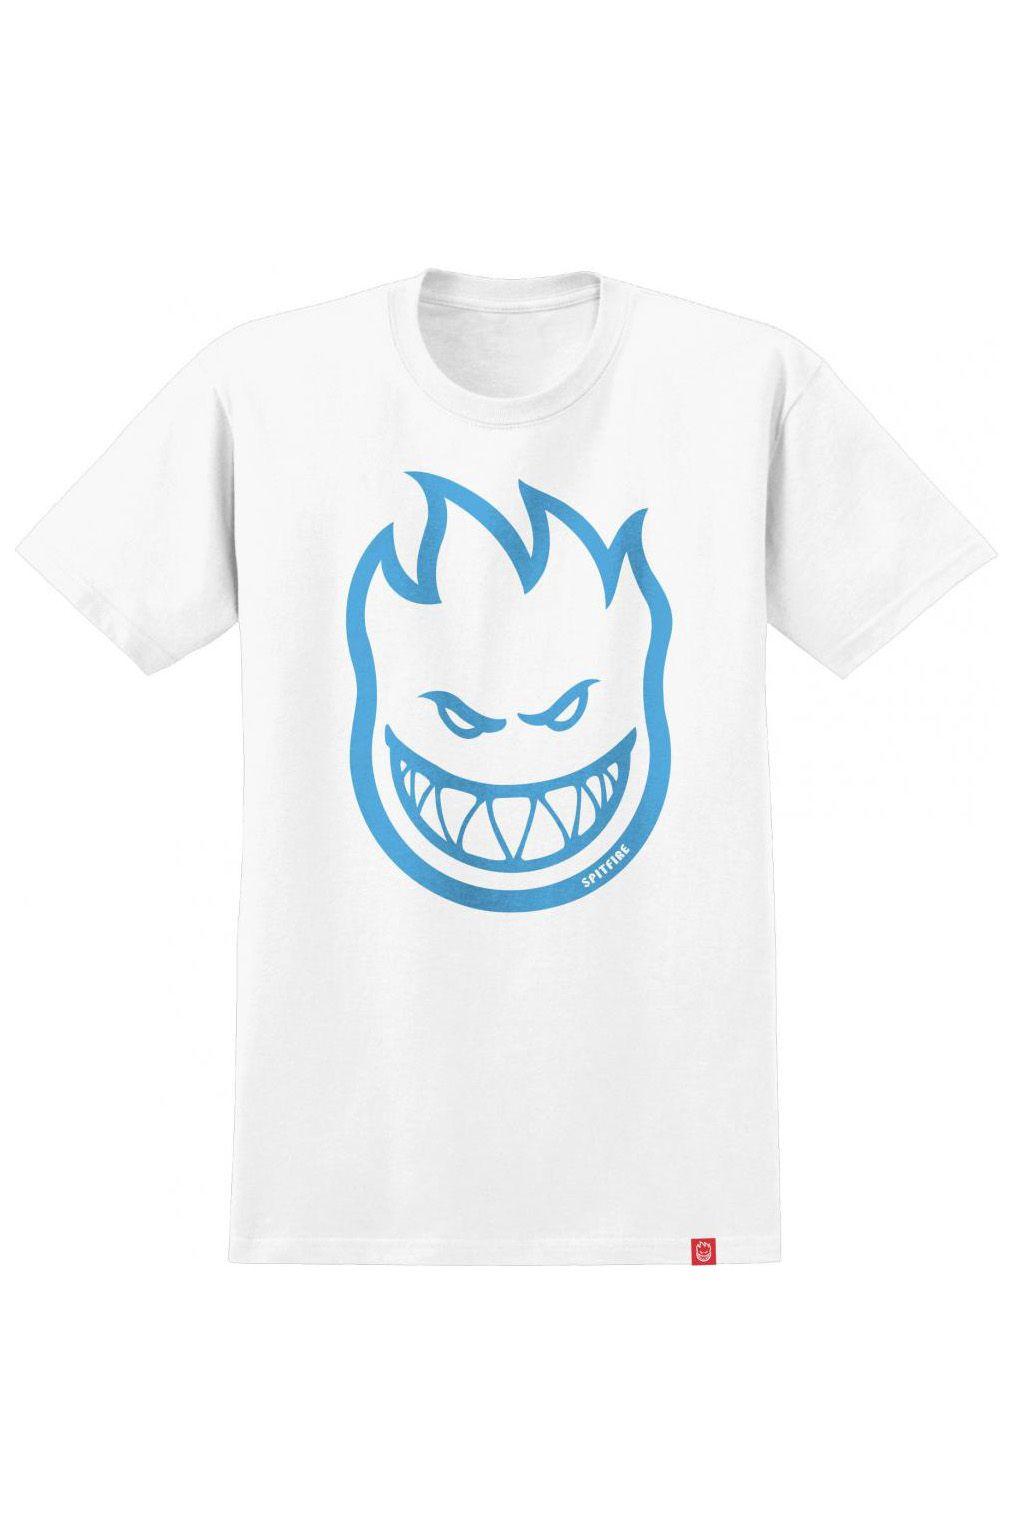 Spitfire T-Shirt BIGHEAD White/Lt Blue